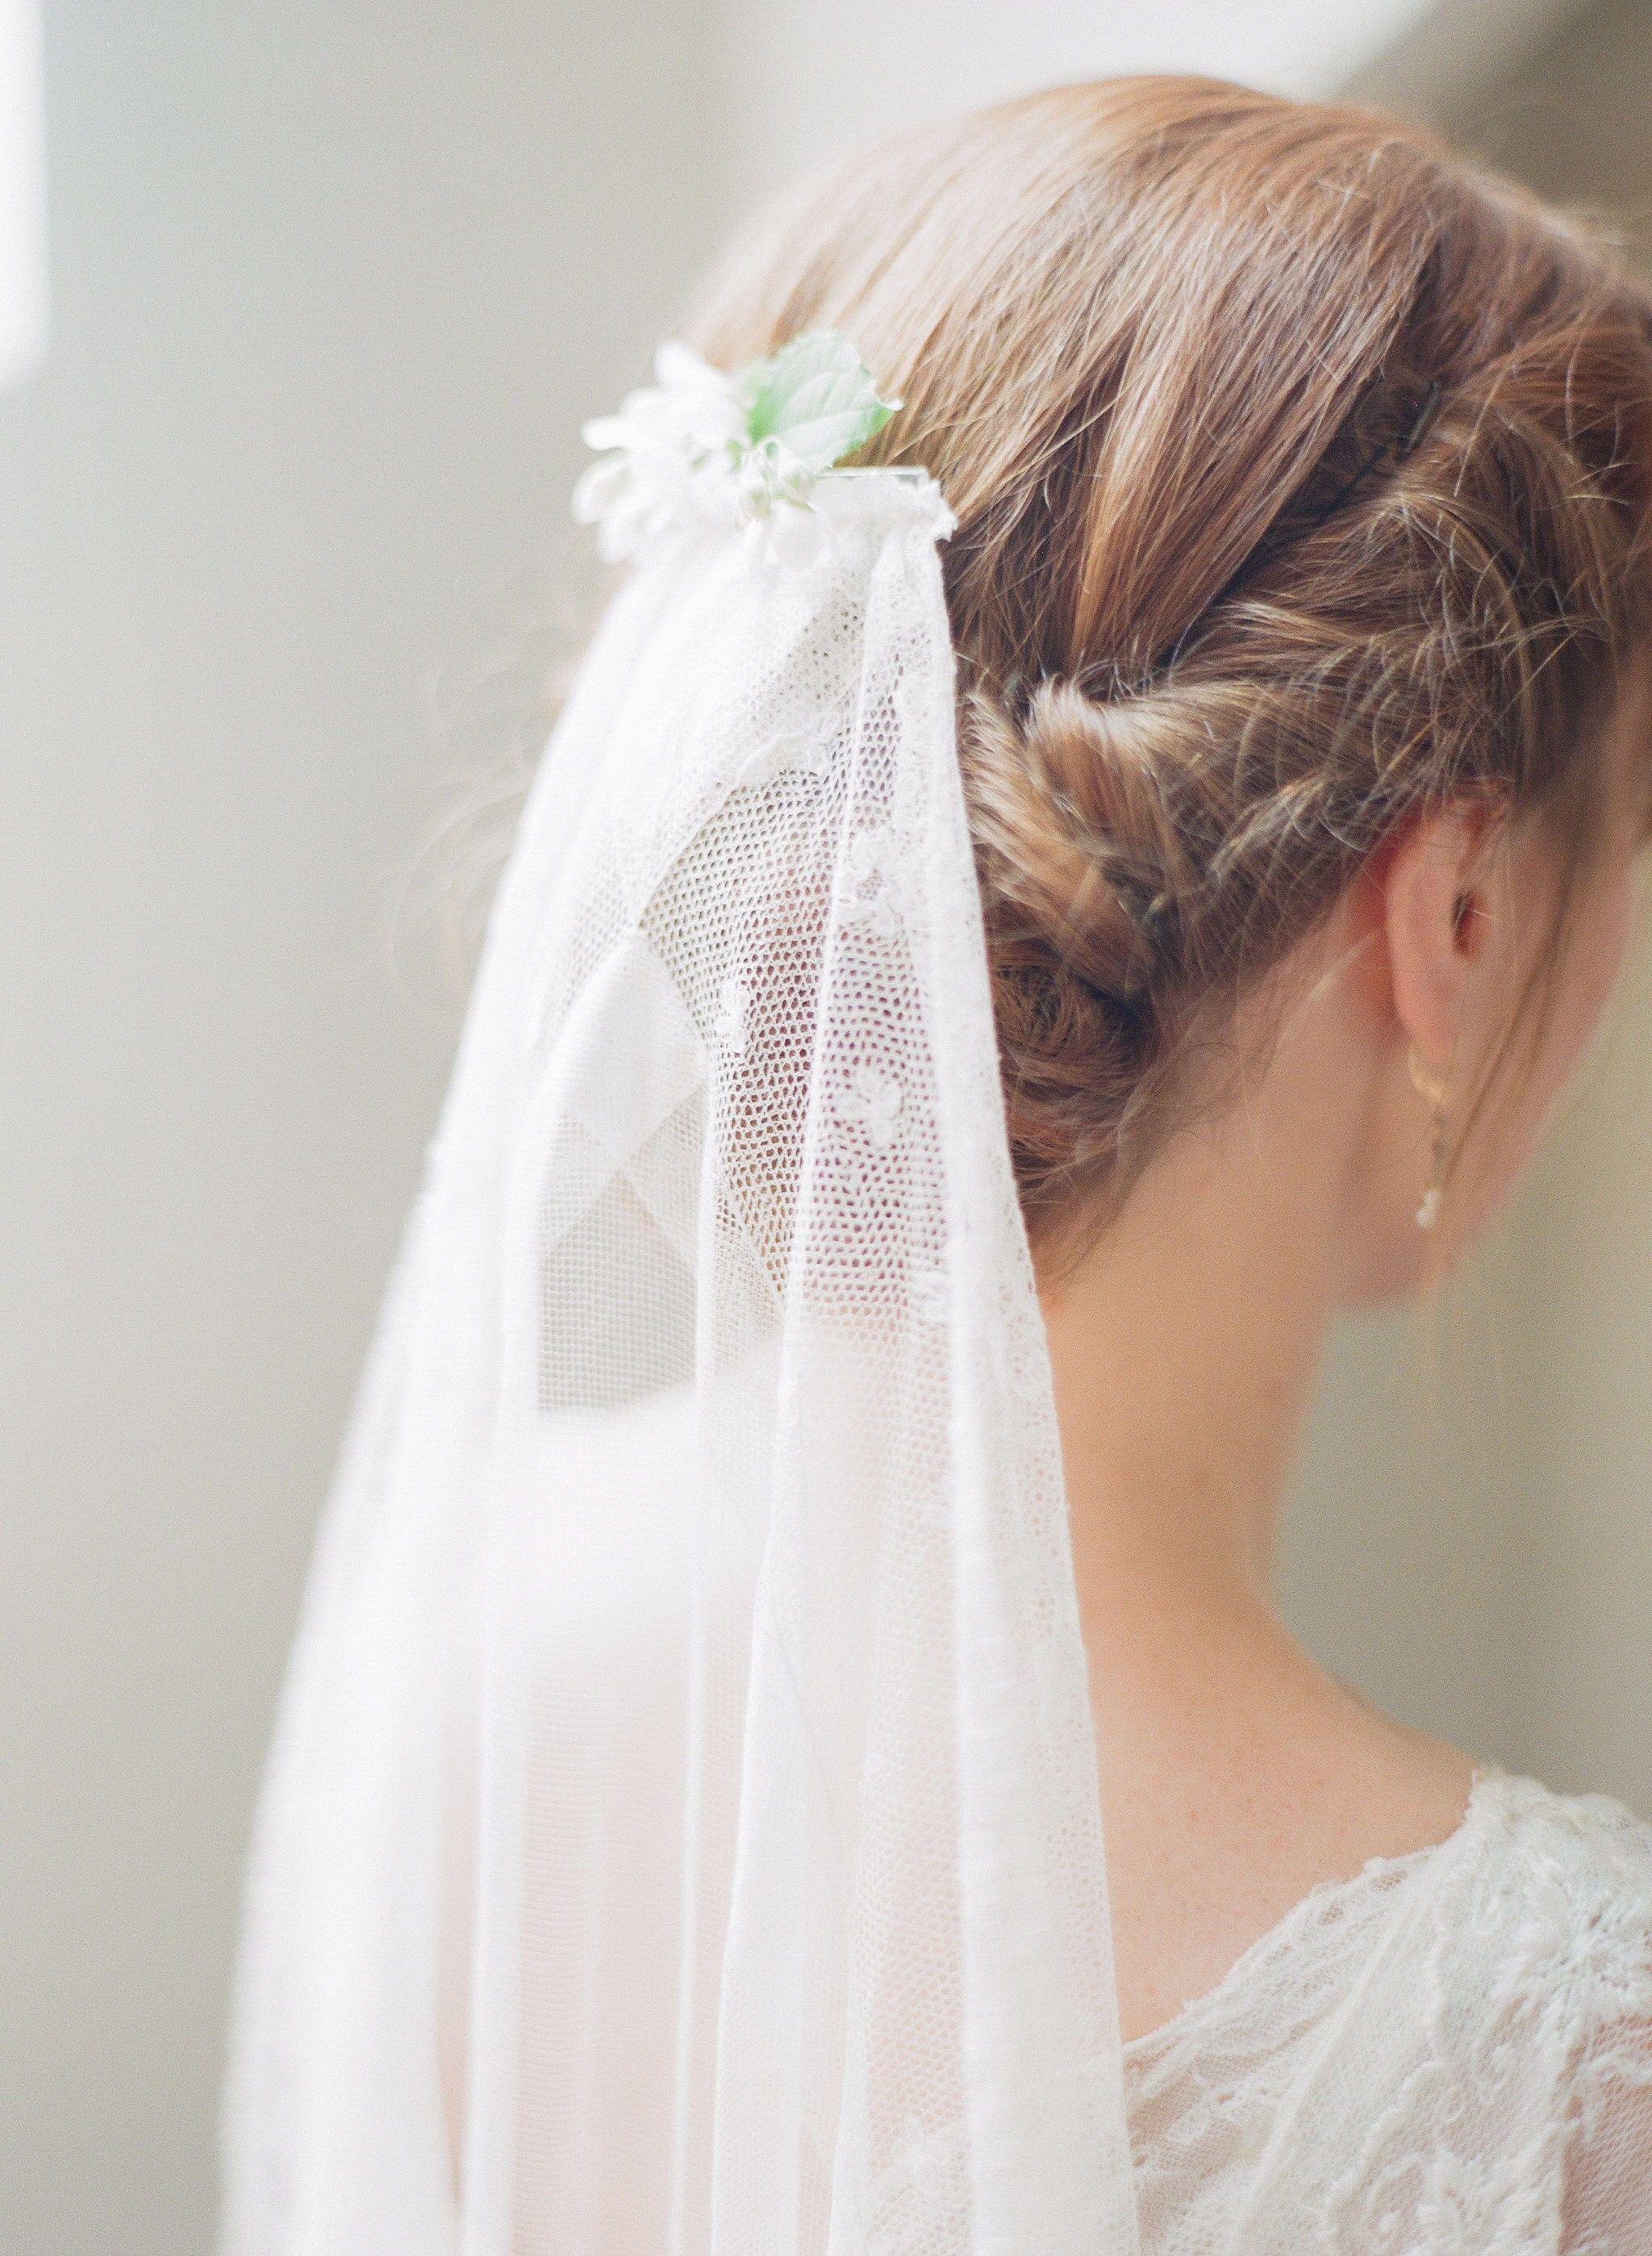 cornwall garden wedding | spring, summer, intimate, romantic